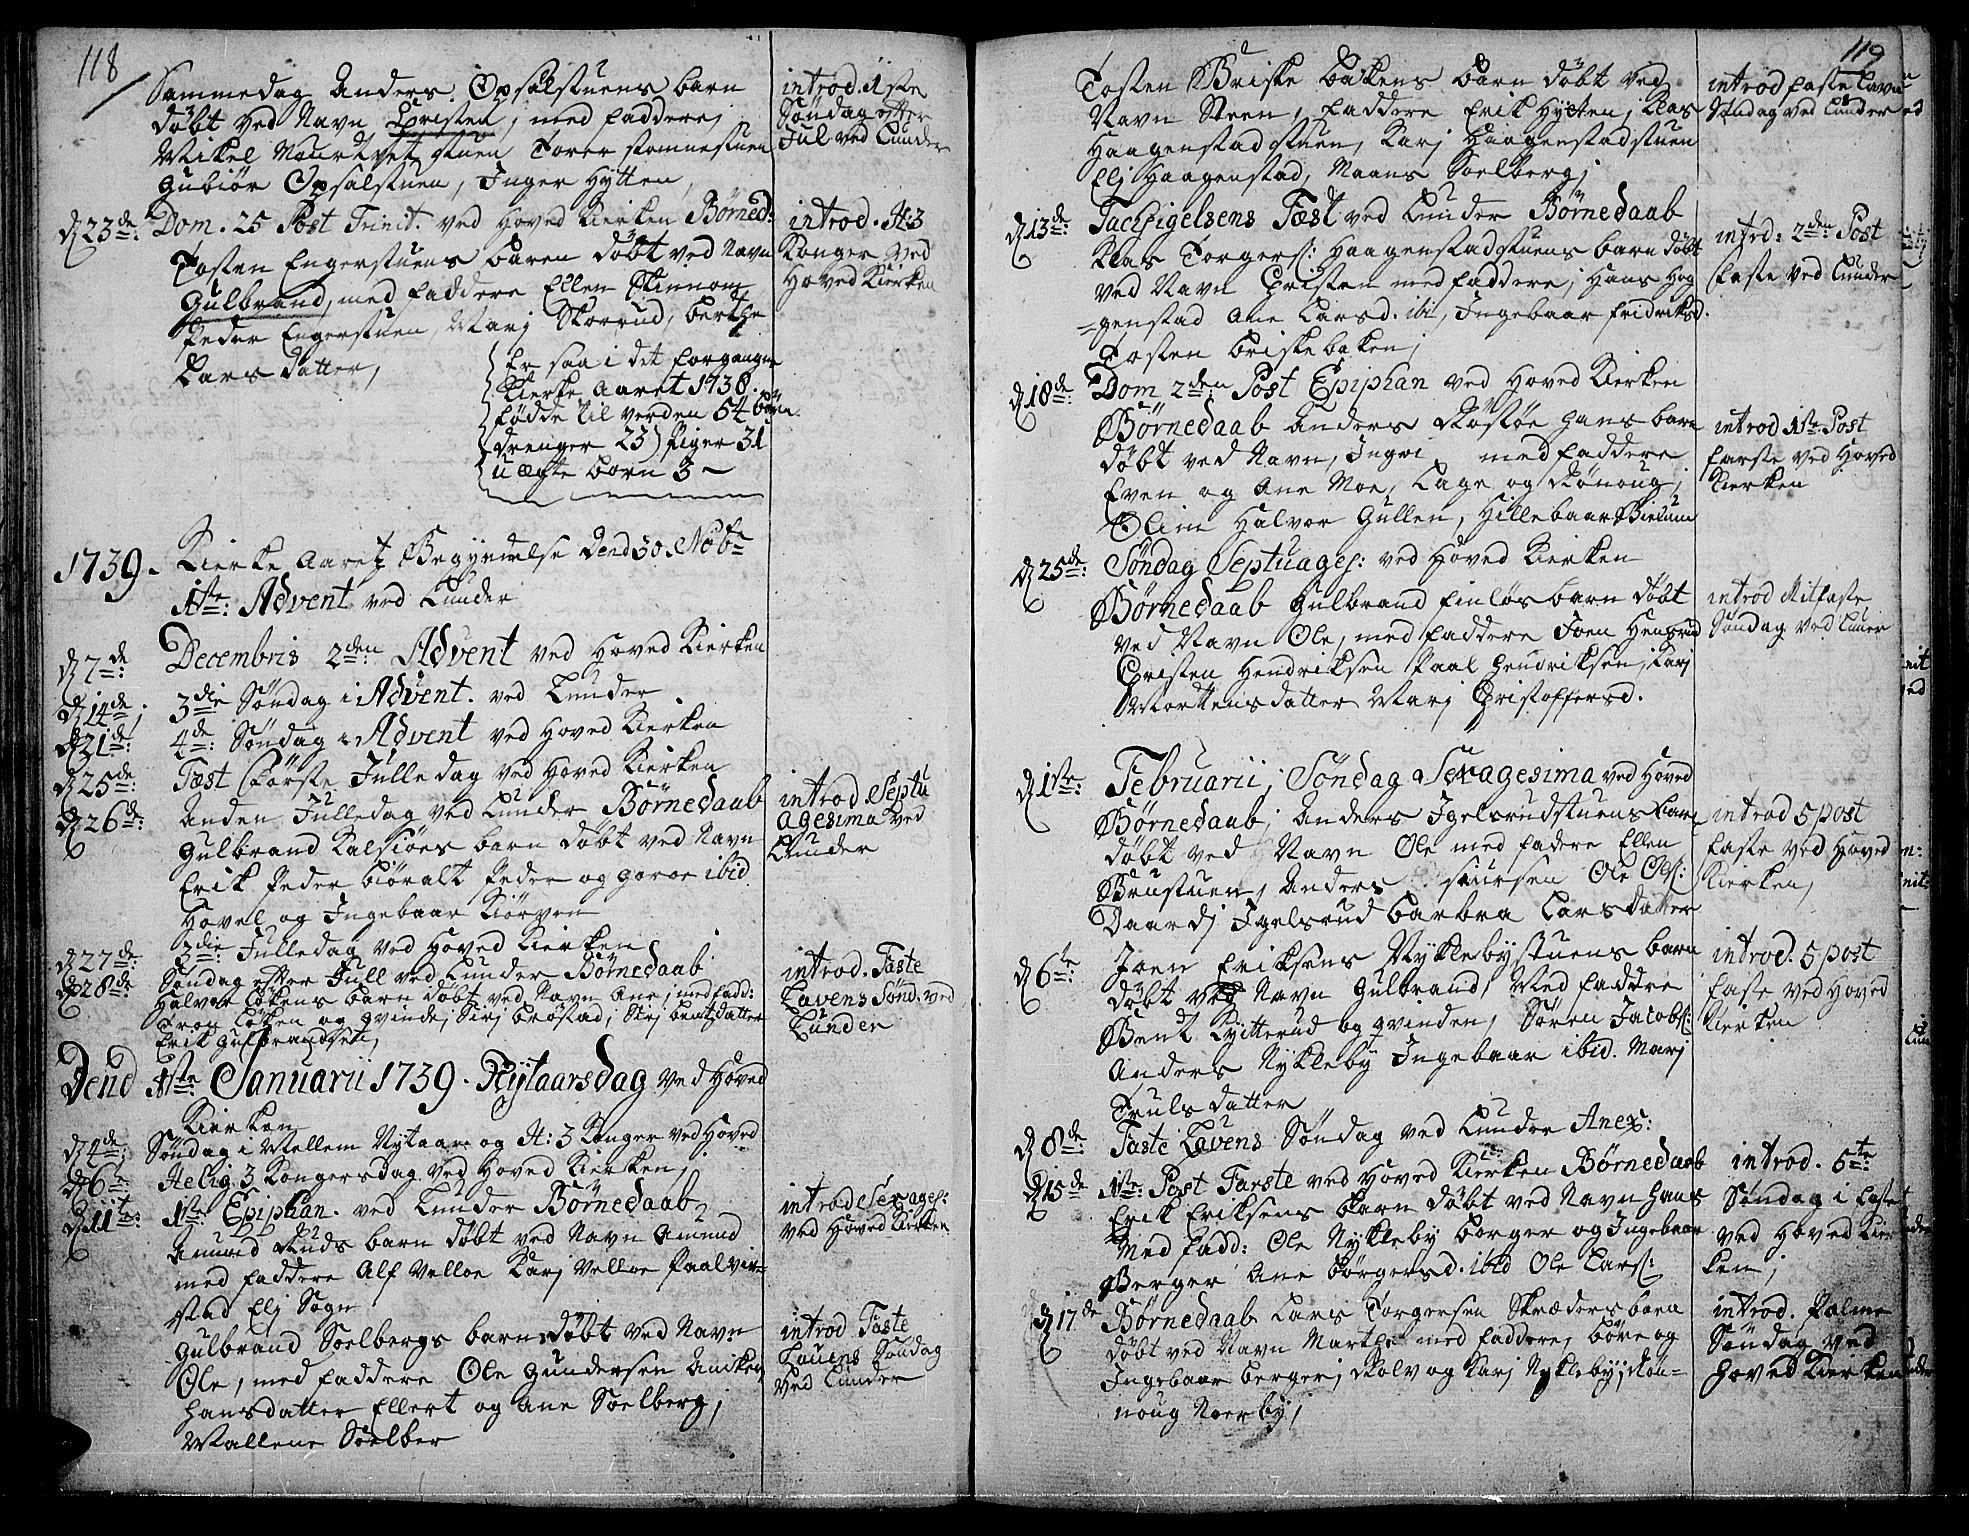 SAH, Jevnaker prestekontor, Ministerialbok nr. 2, 1725-1751, s. 118-119